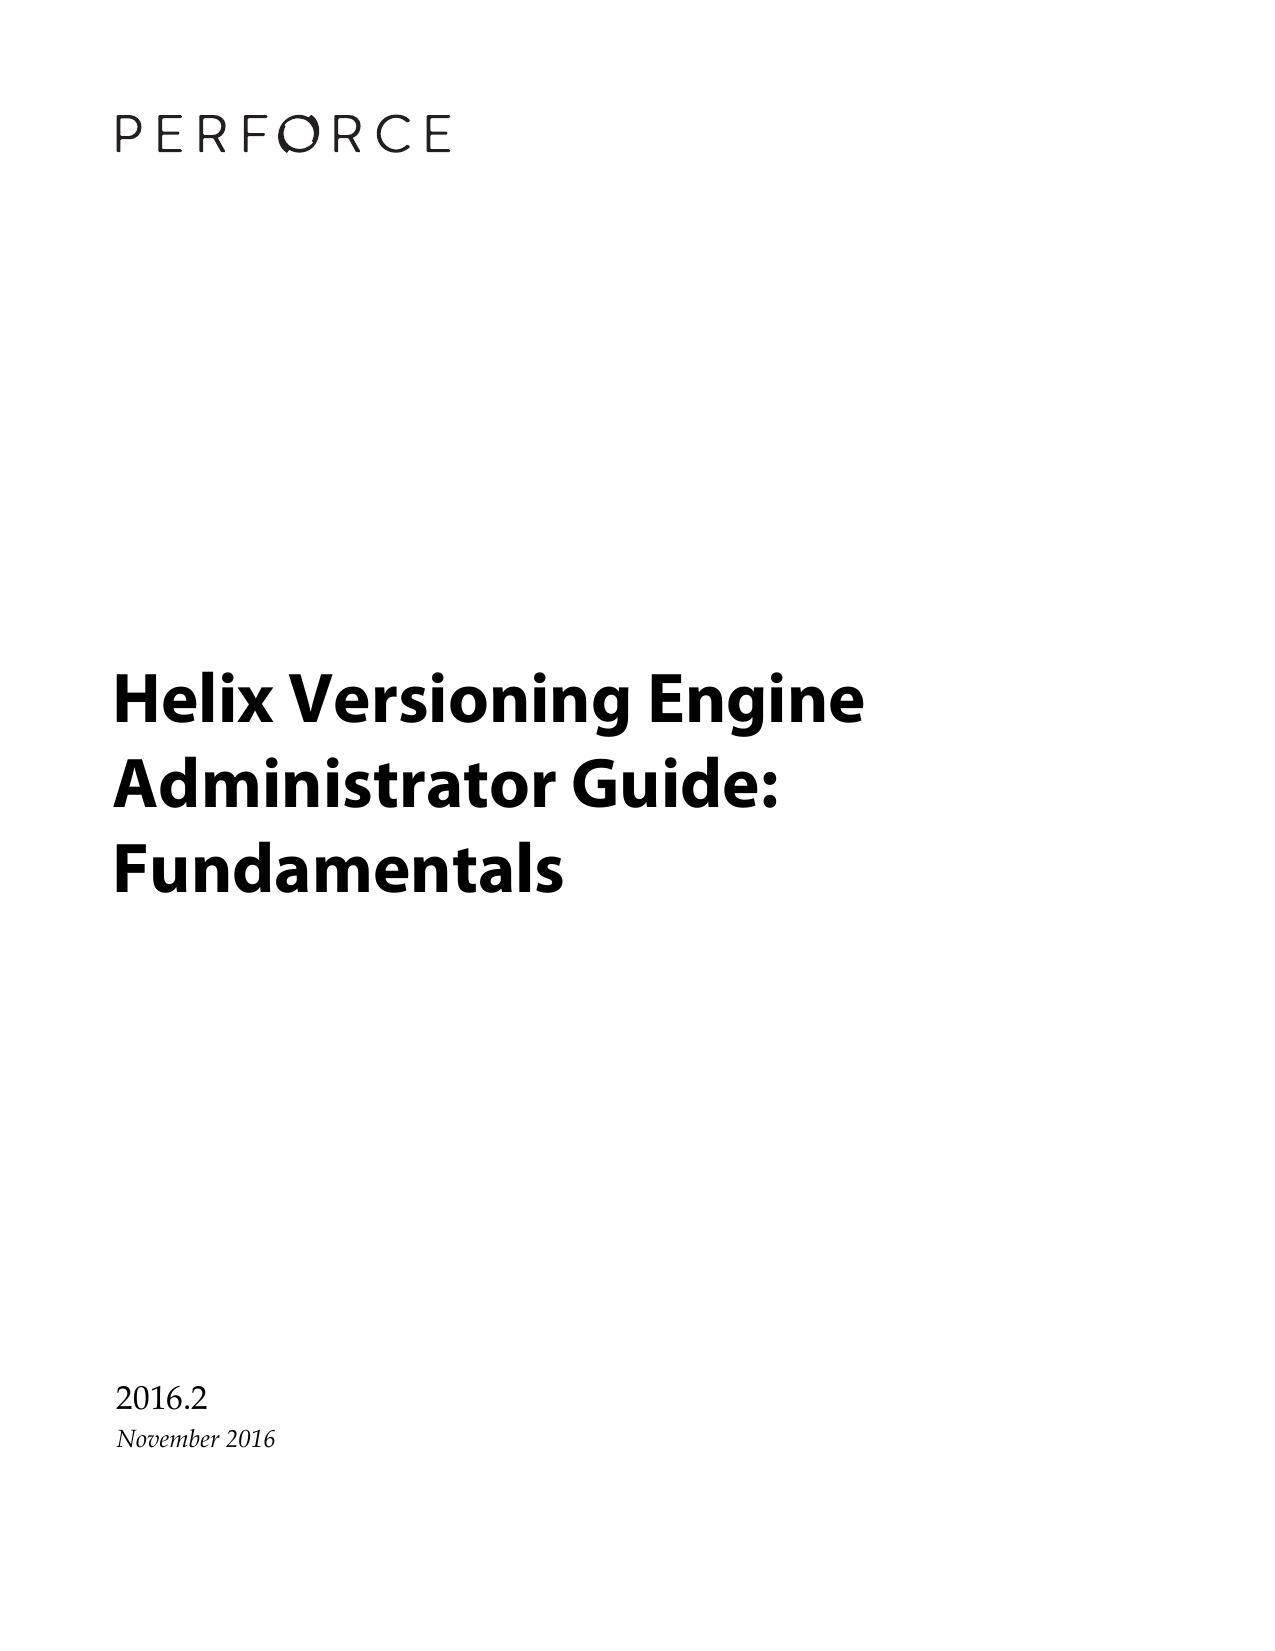 Helix Versioning Engine Administrator Guide | manualzz com